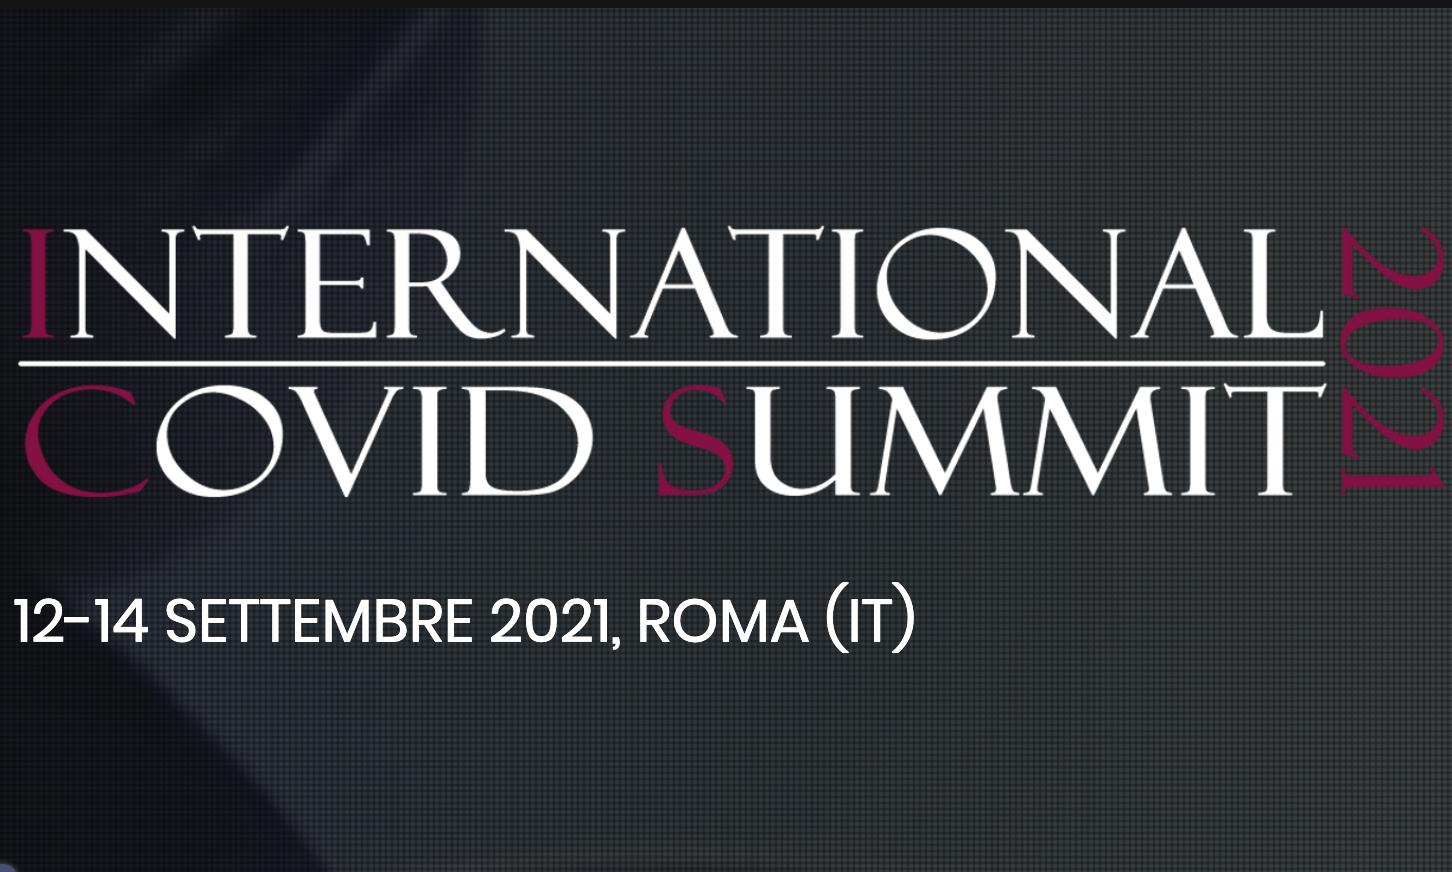 Roma, 12-14 settembre – International Covid Summit 2021